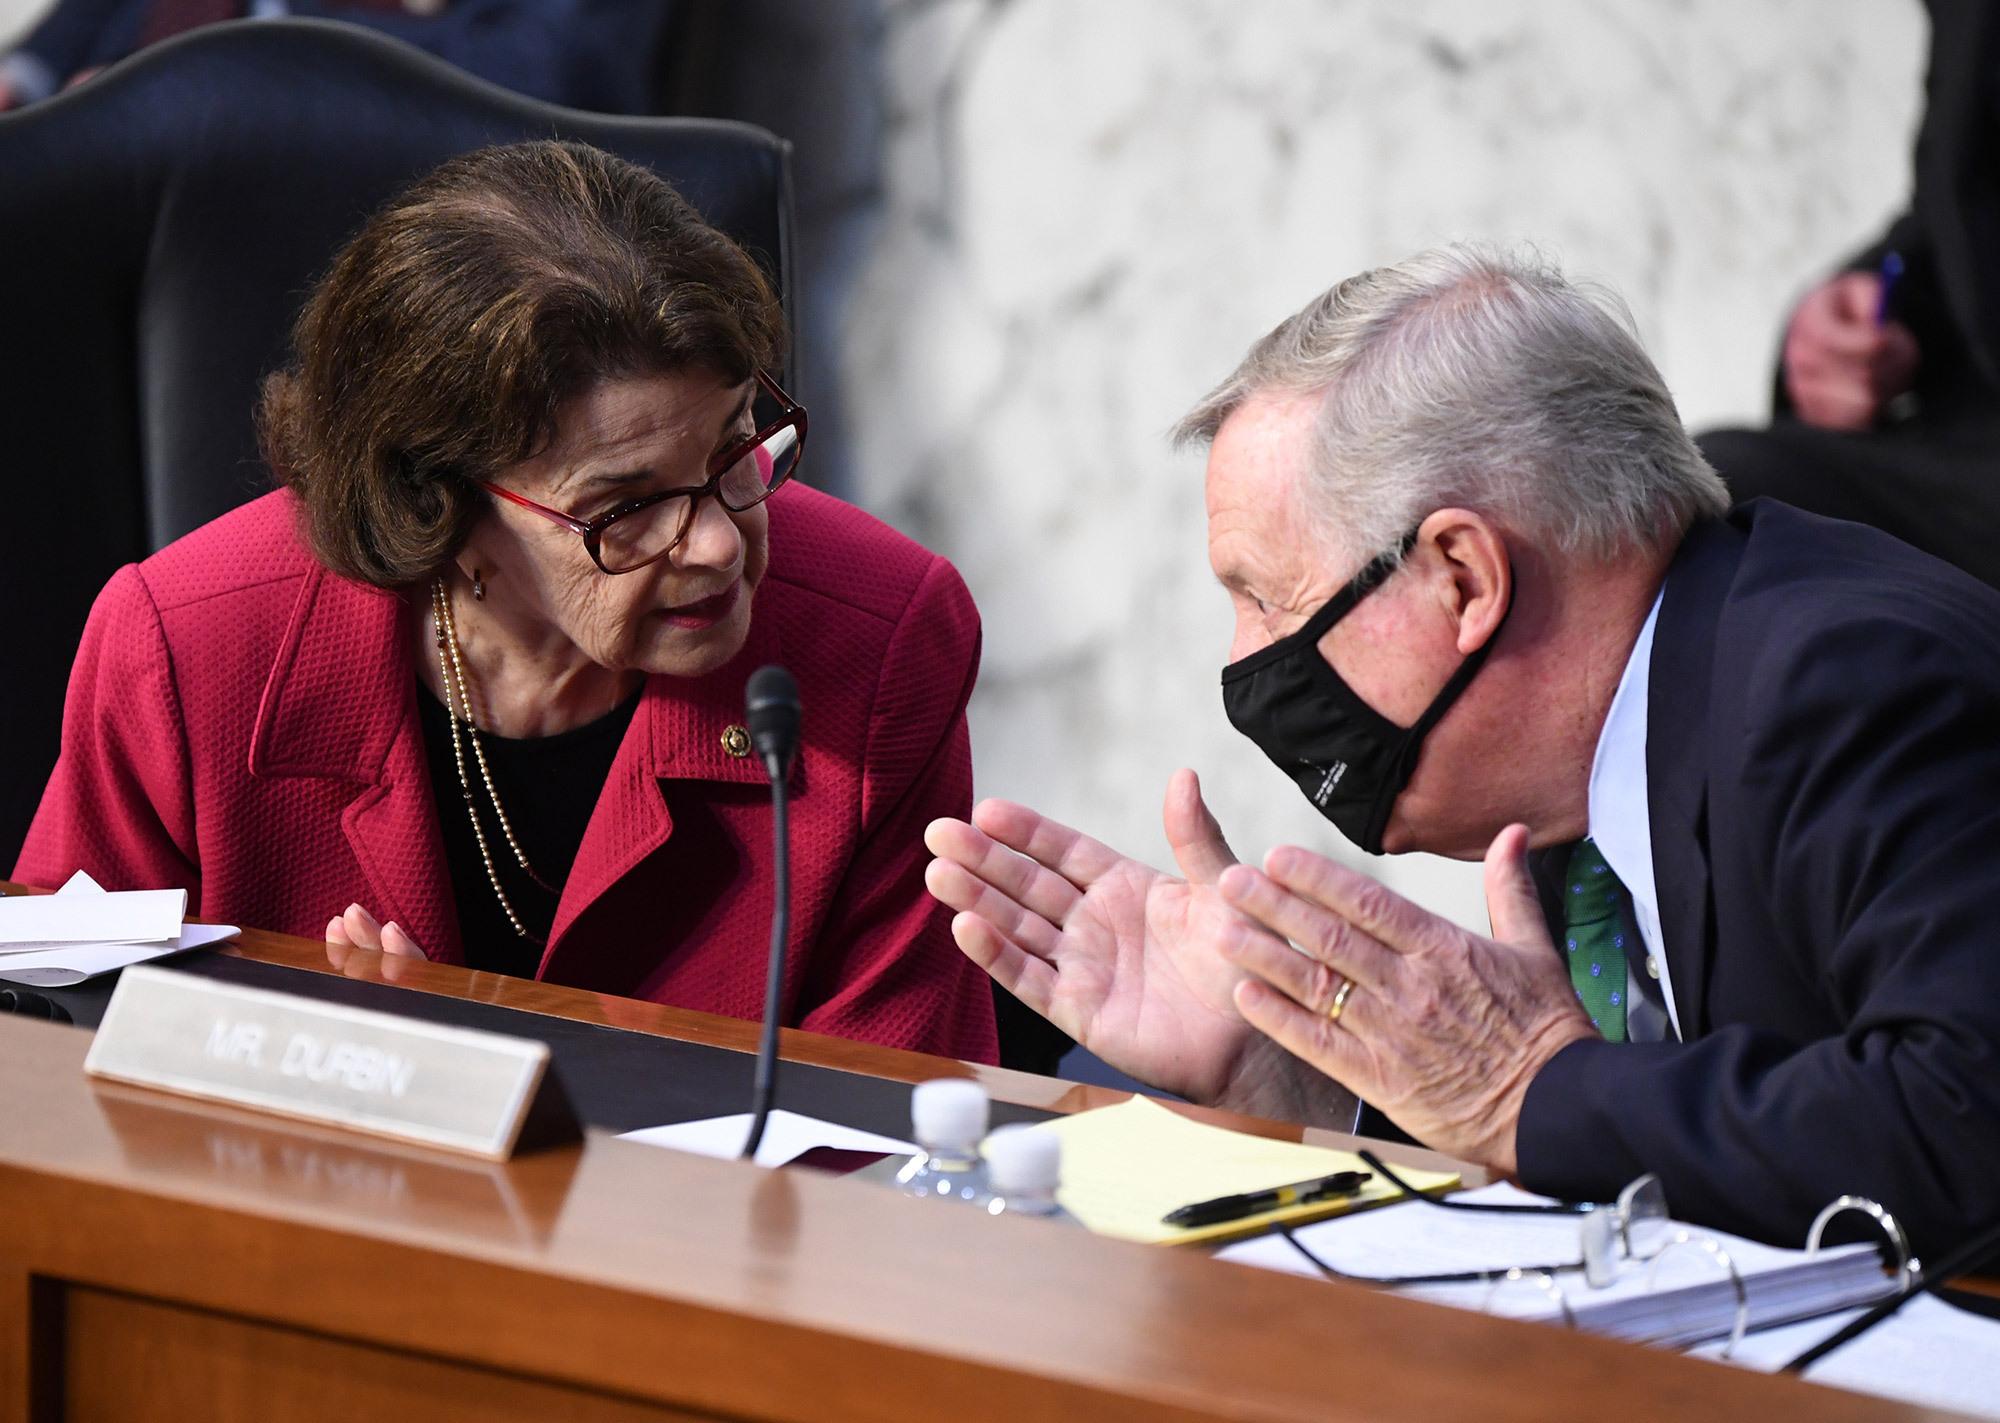 Democrats planning to boycott Senate Judiciary vote to advance Barrett nomination